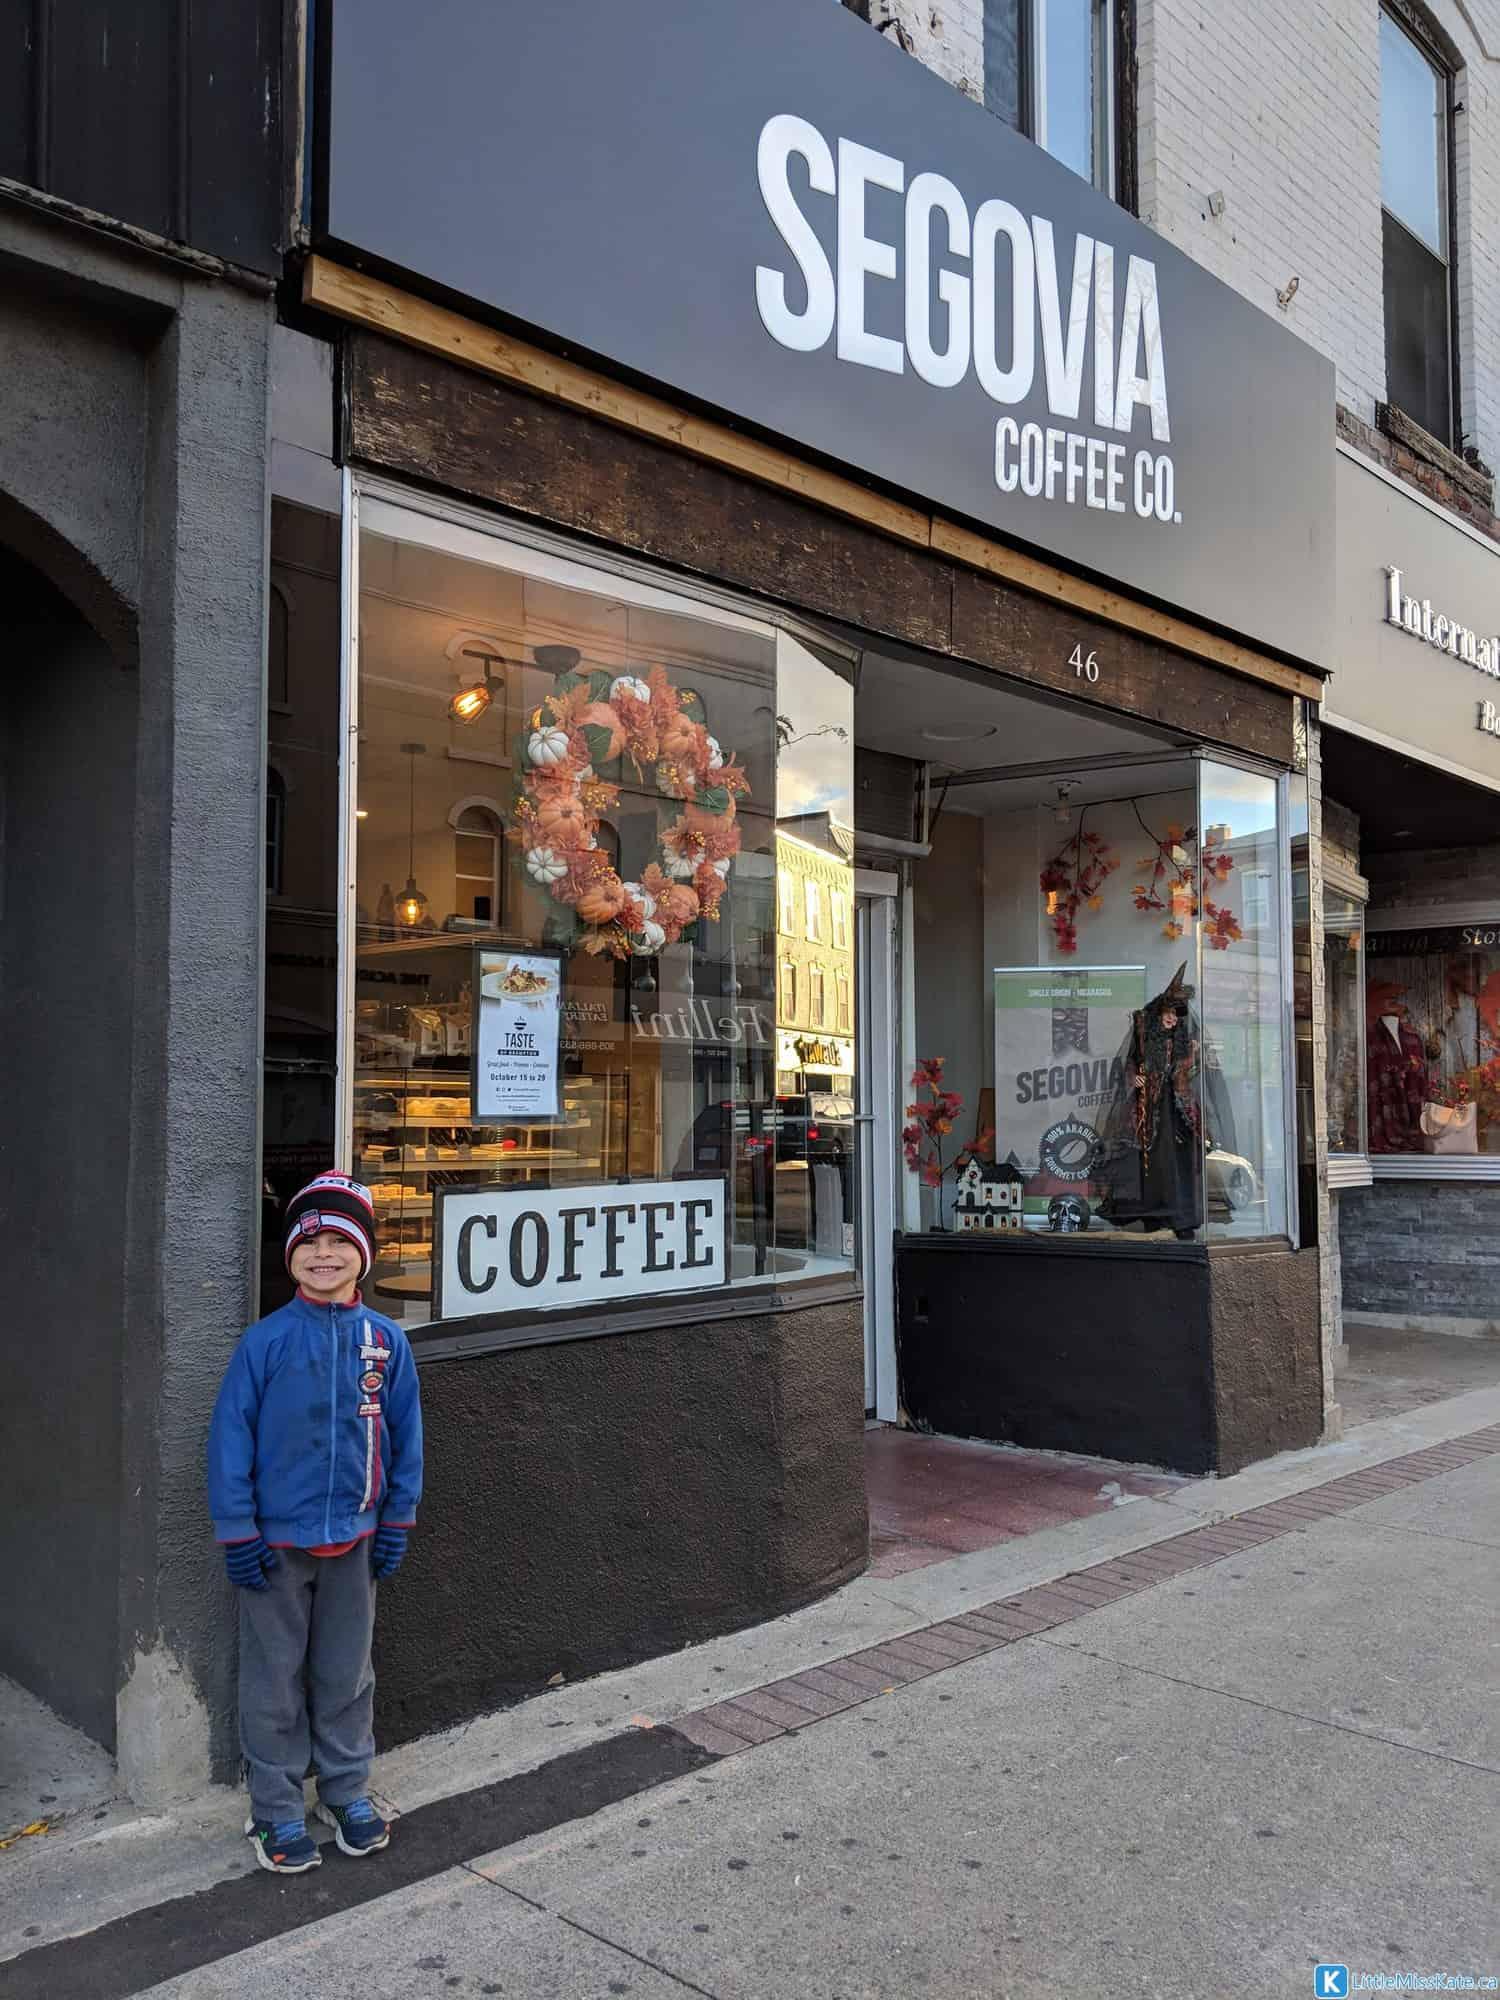 best pleaces to eat in Brampton Segovia coffee